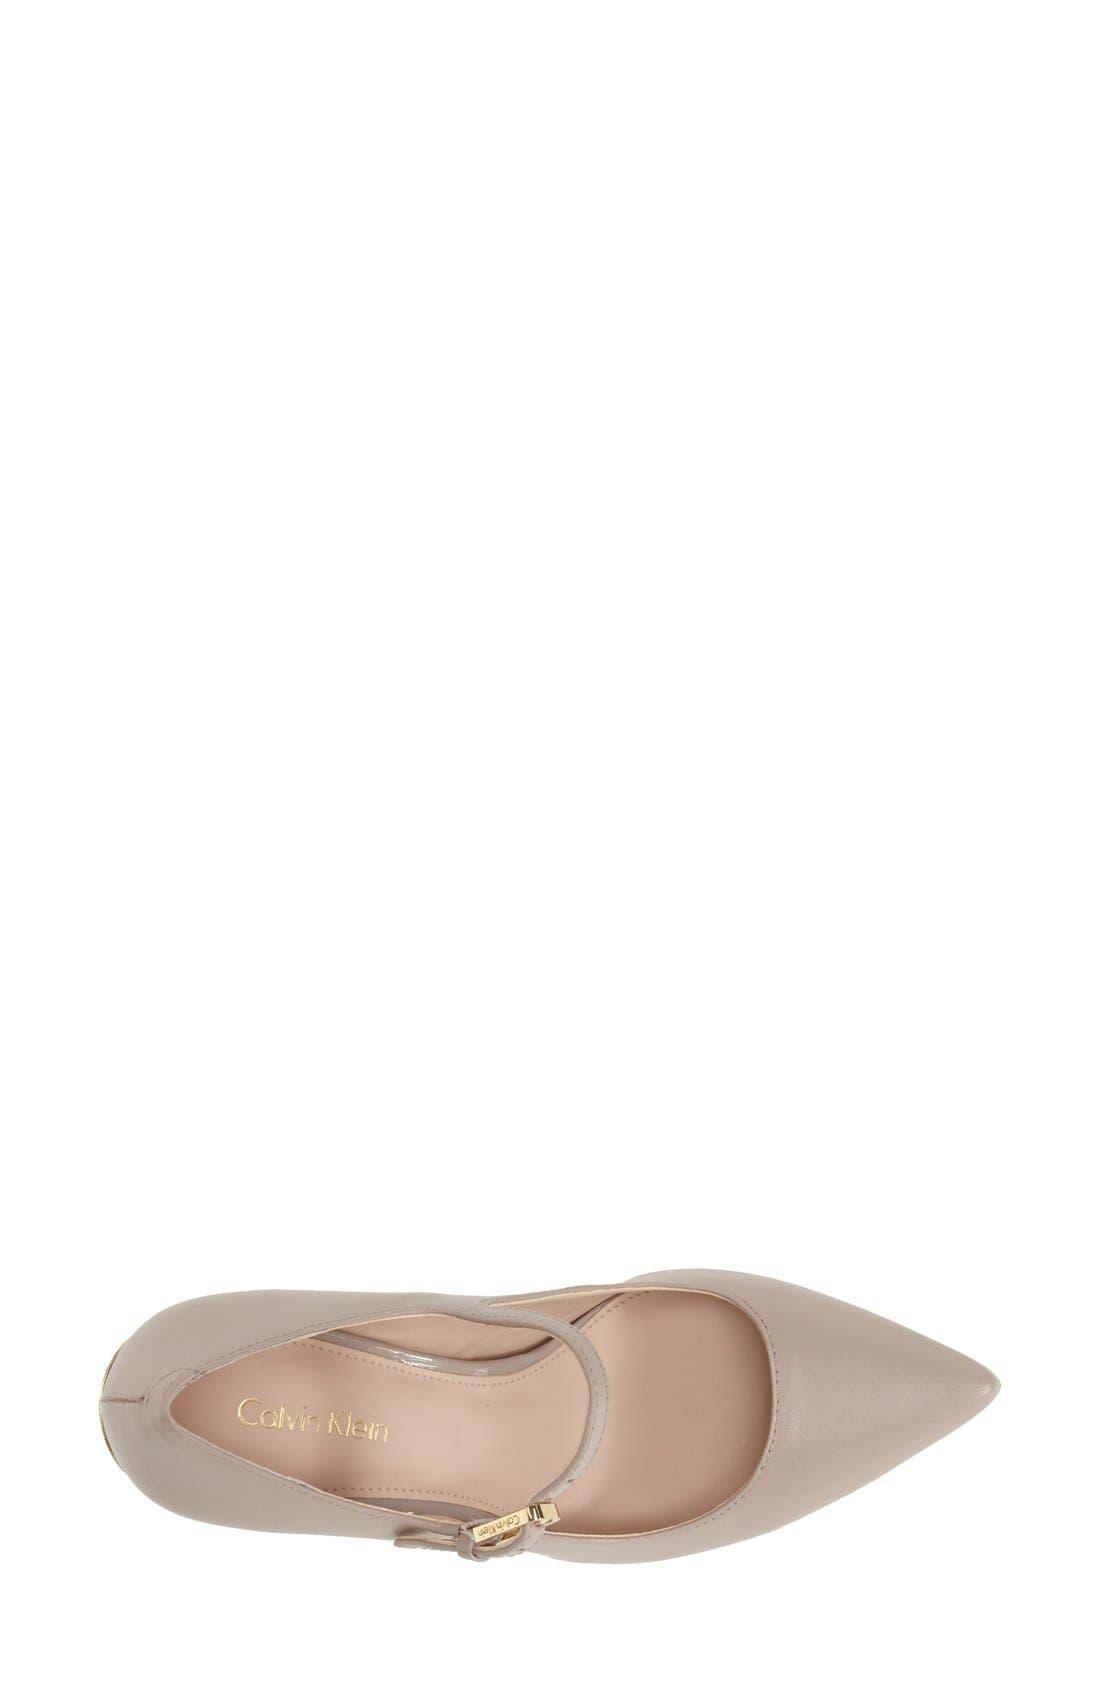 Alternate Image 3  - Calvin Klein 'Genavee' Pointy Toe Pump (Women)